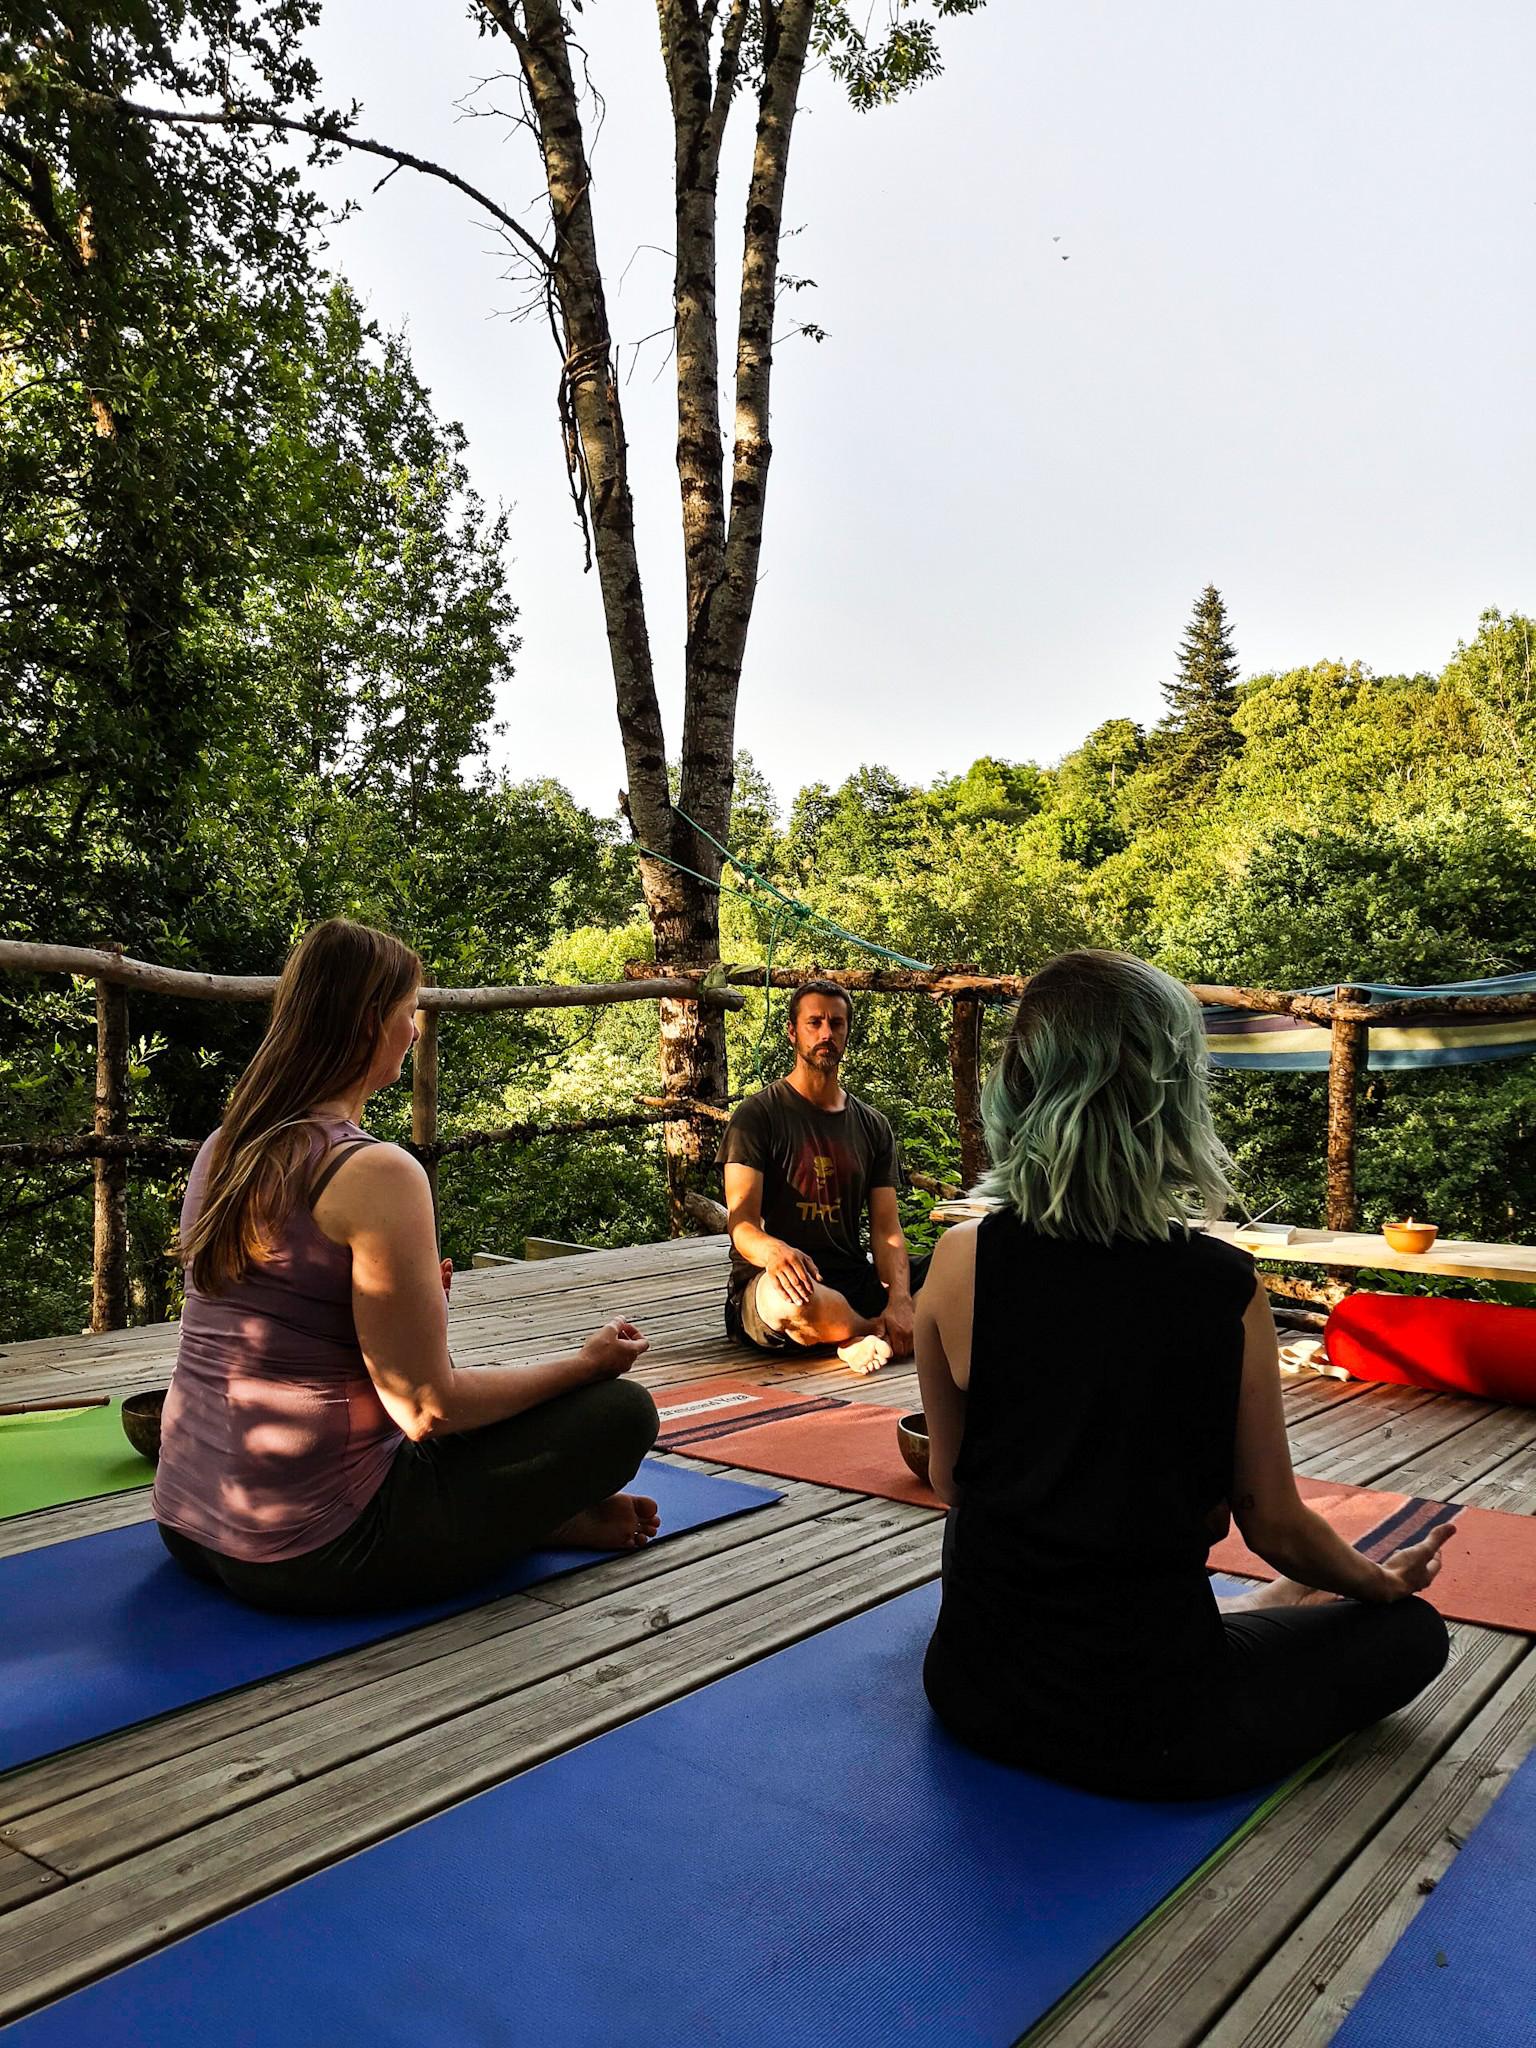 Shady Meditation Sessions